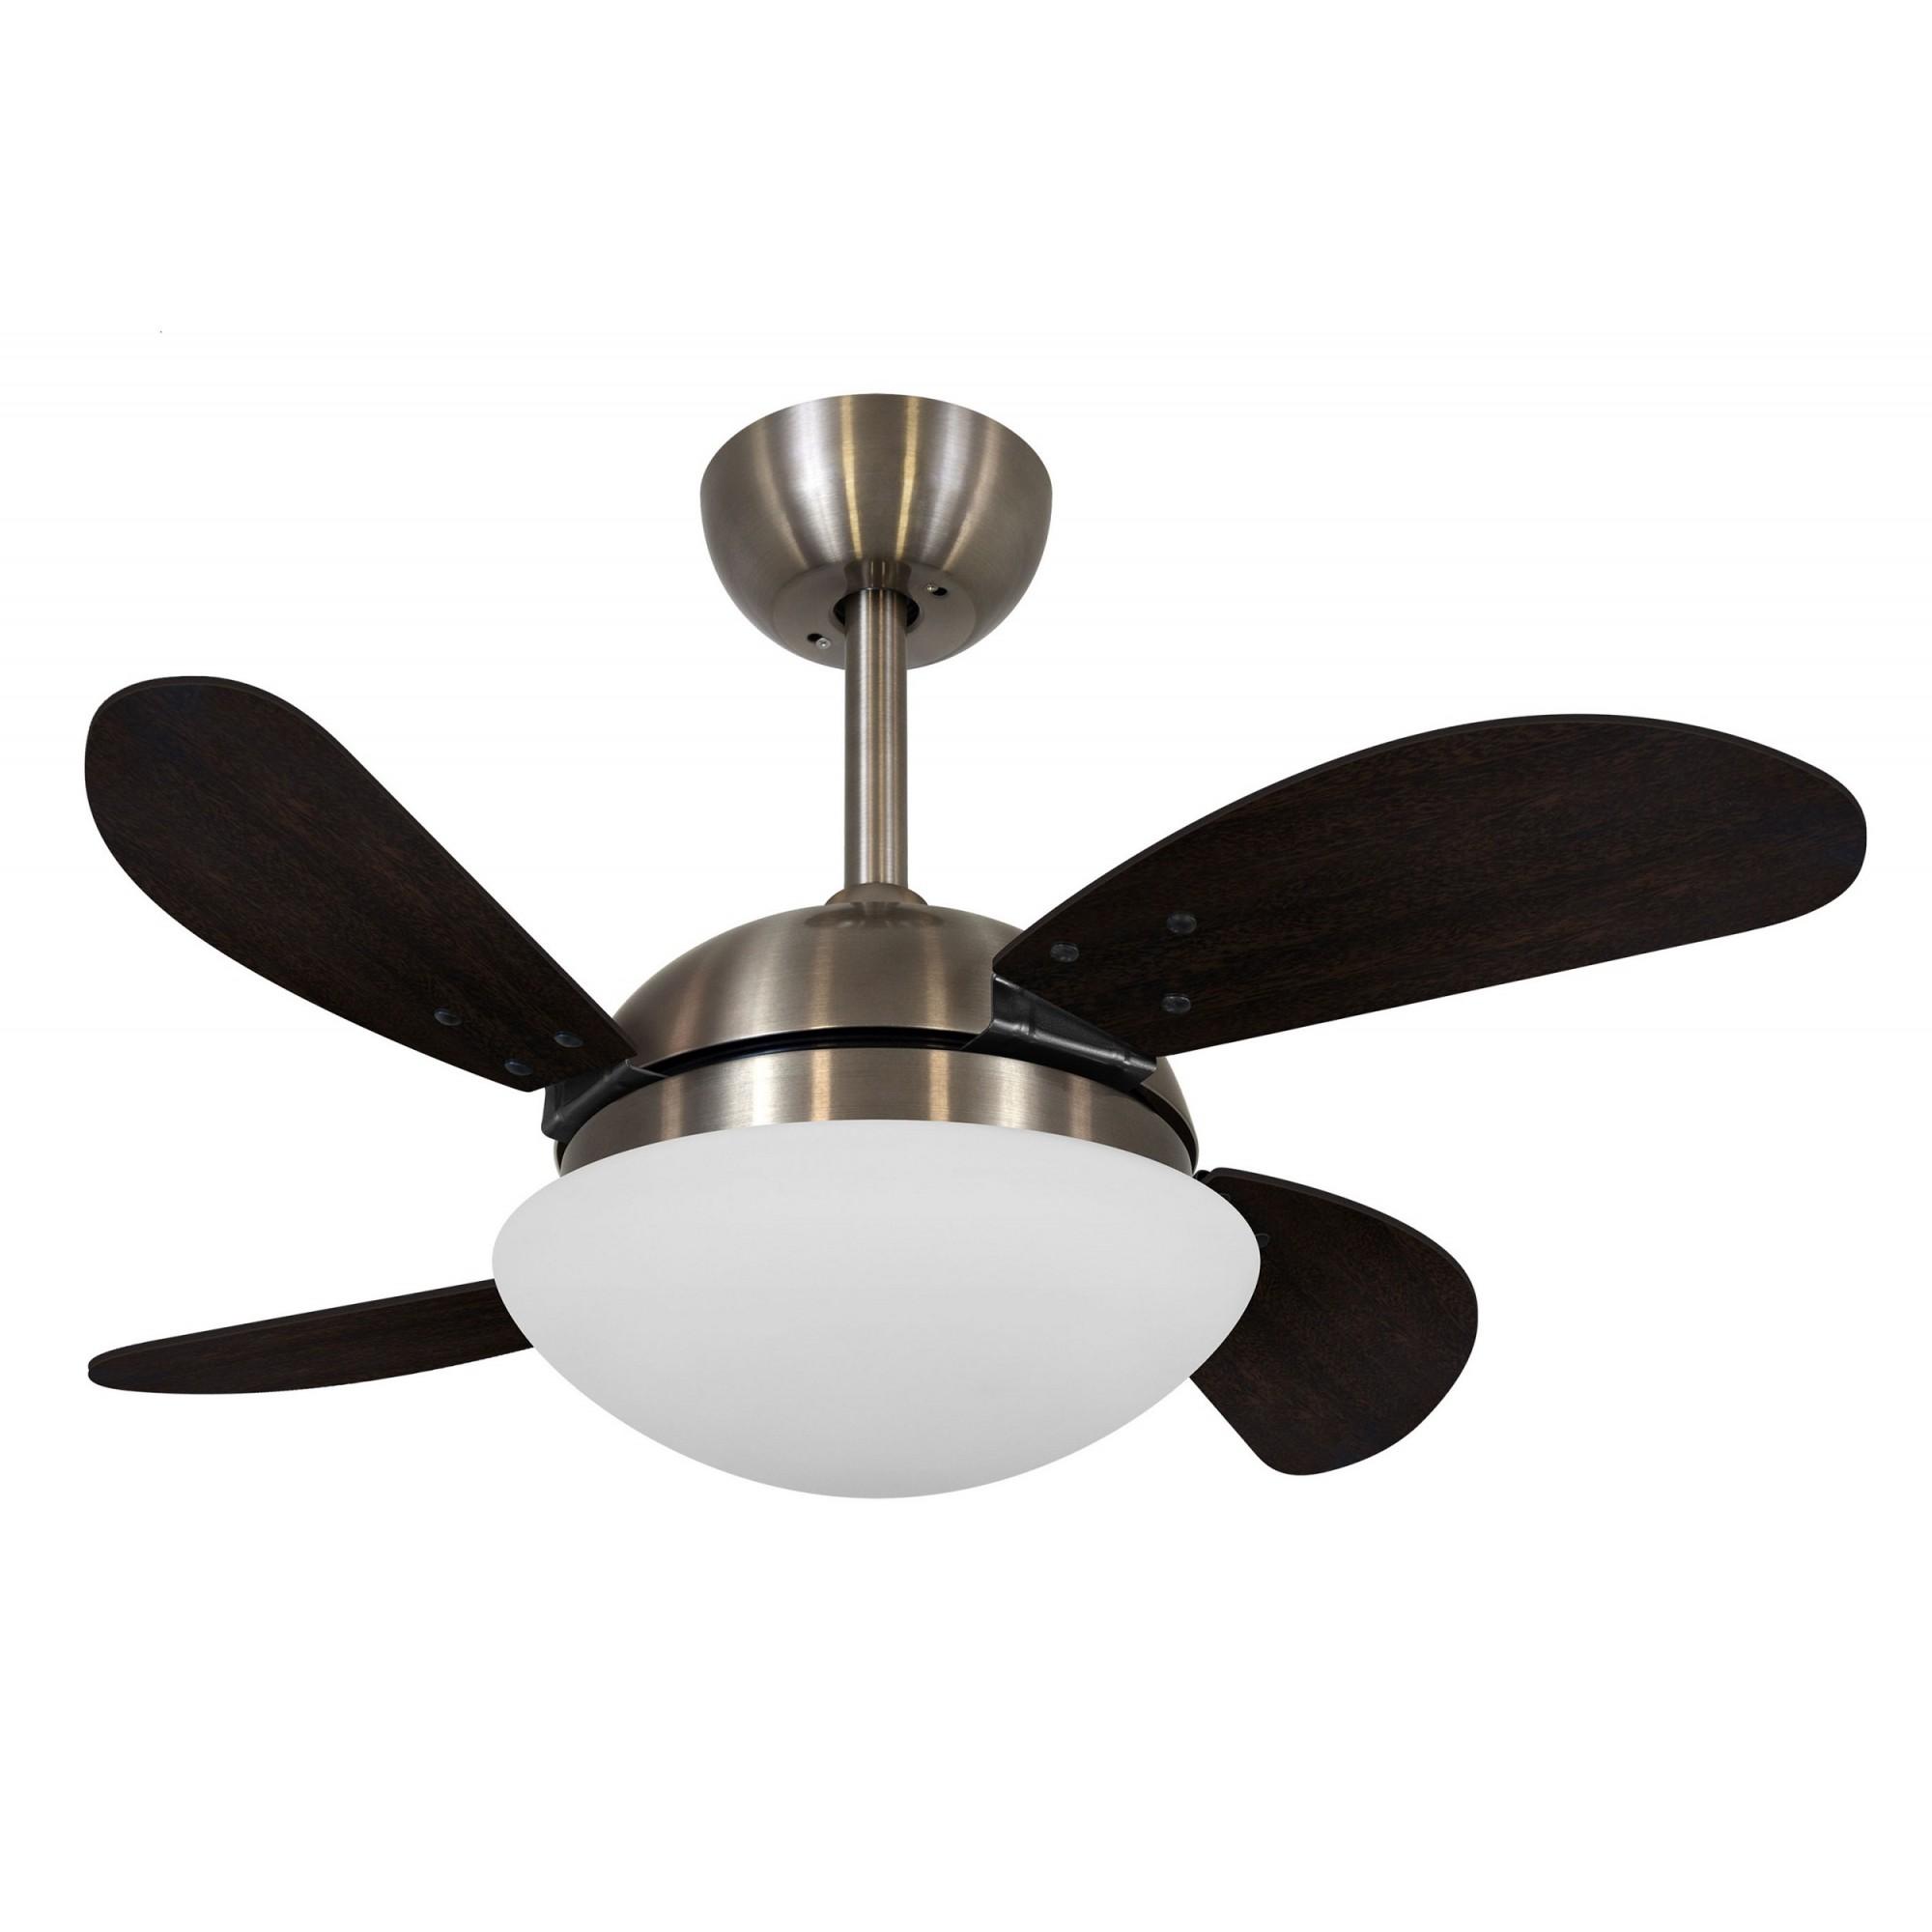 Ventilador de Teto VD28 Mini Fly Bronze/Tb 220V+Controle R.